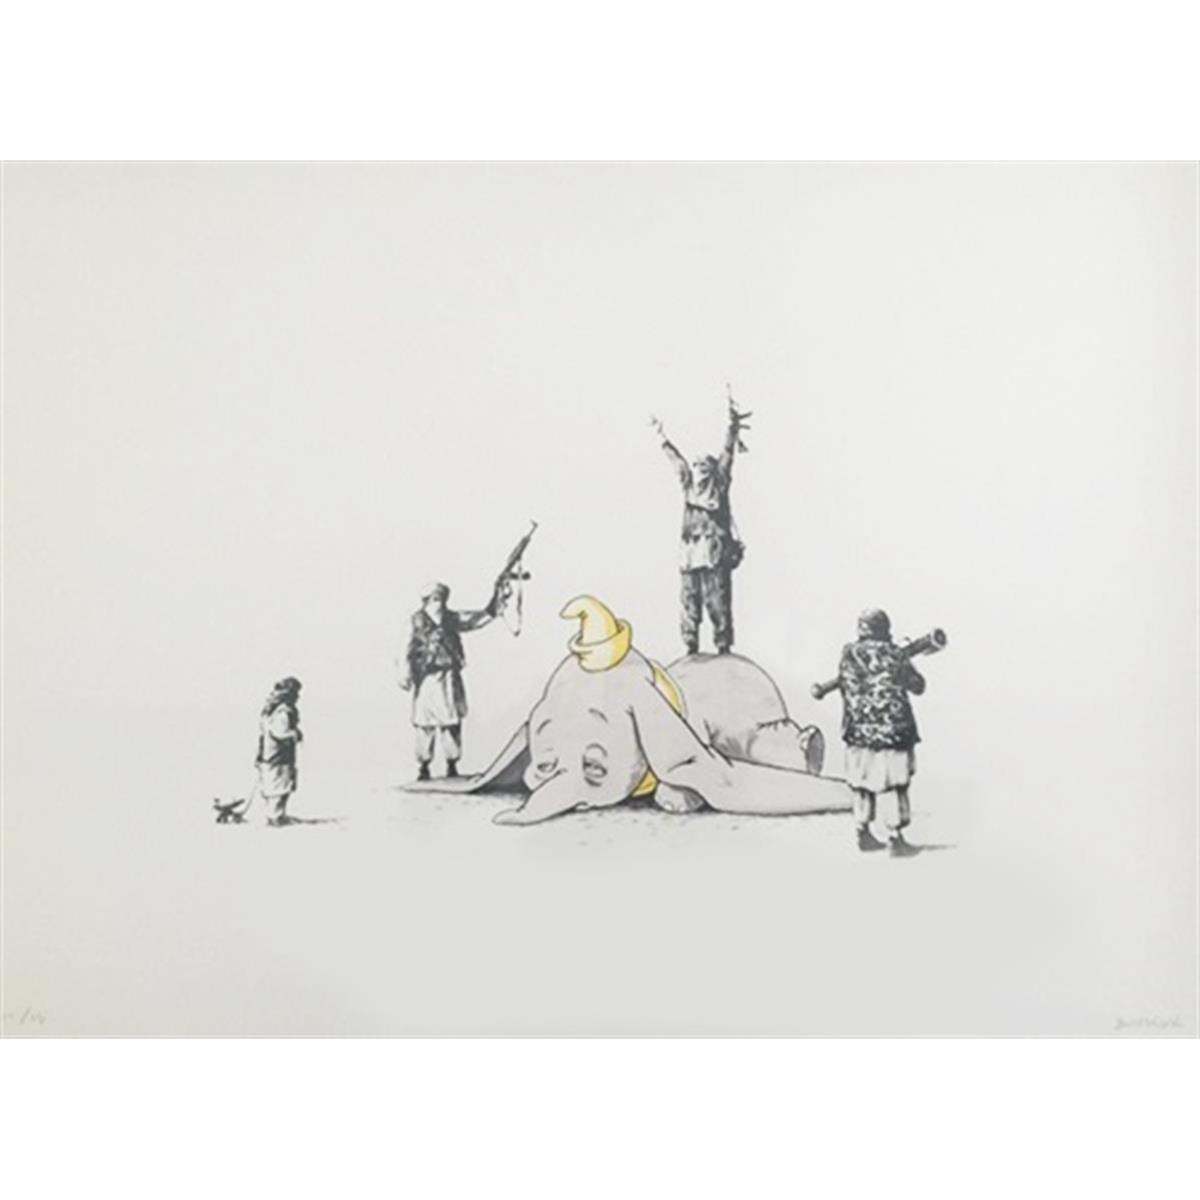 Dumbo by Banksy